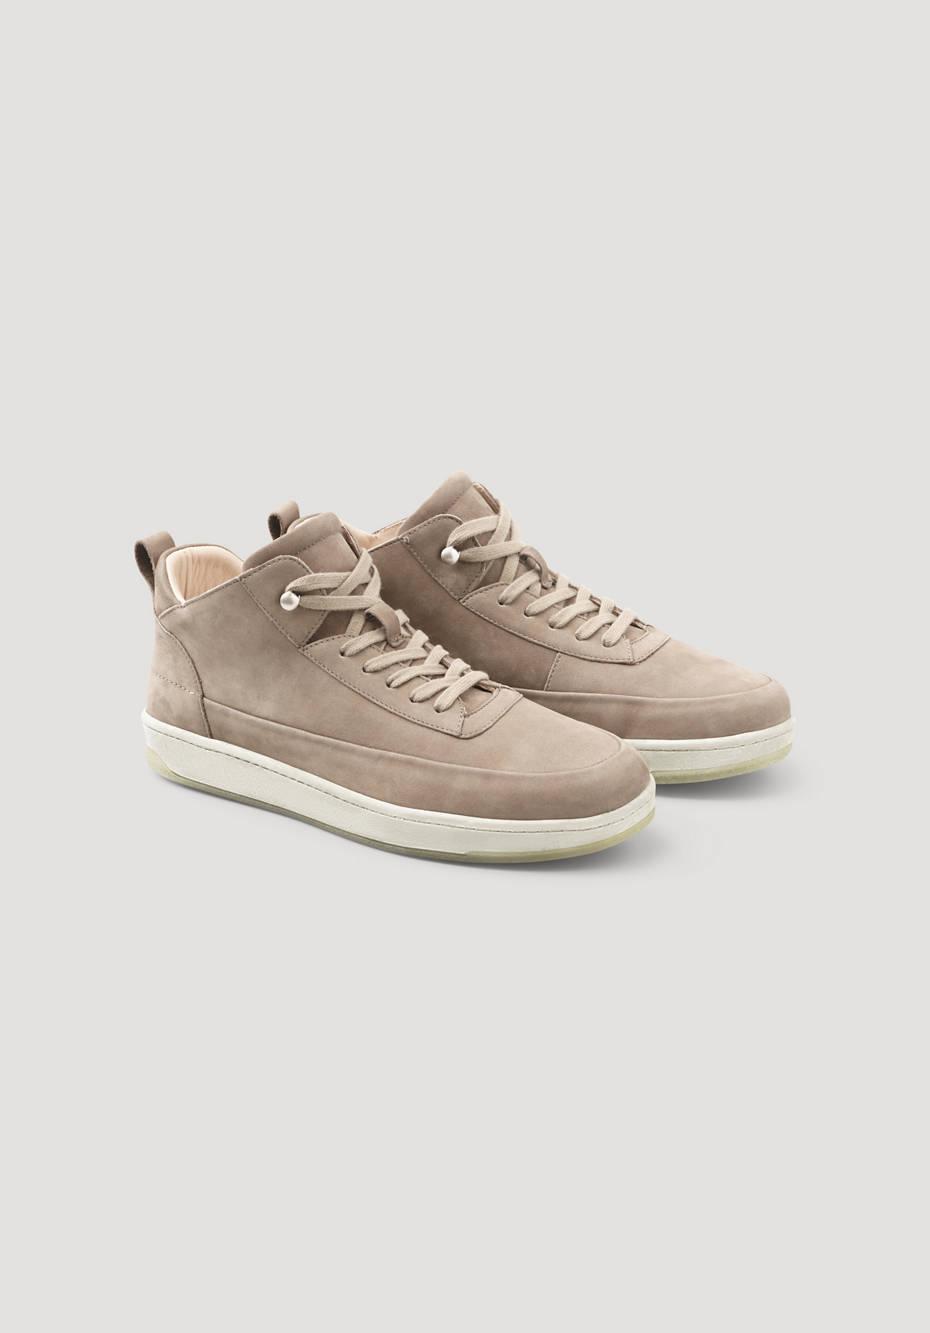 Sneaker with algae sole